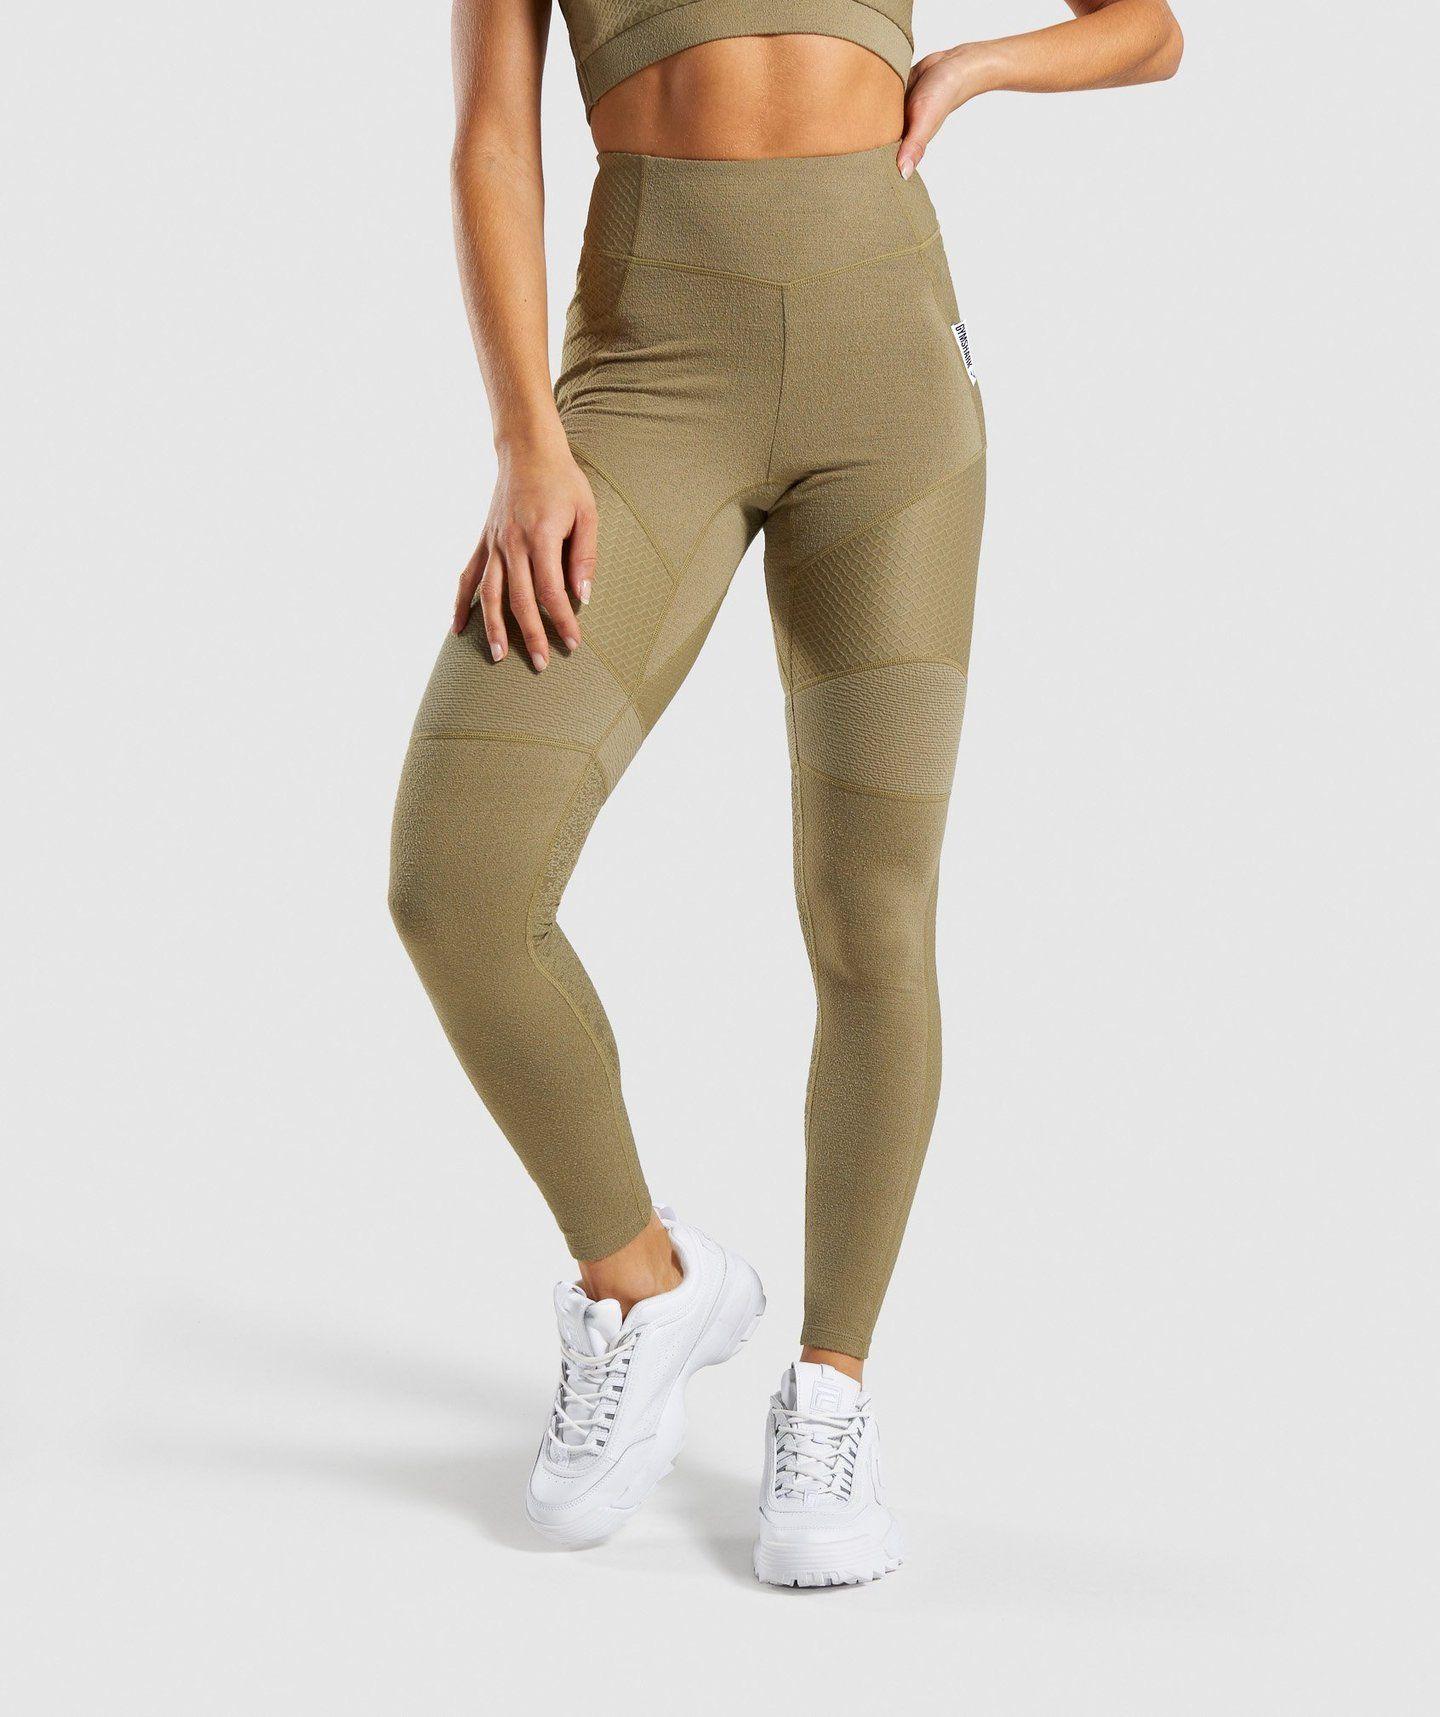 3372bf308c Gymshark True Texture Leggings - Washed Khaki in 2019 | health ...